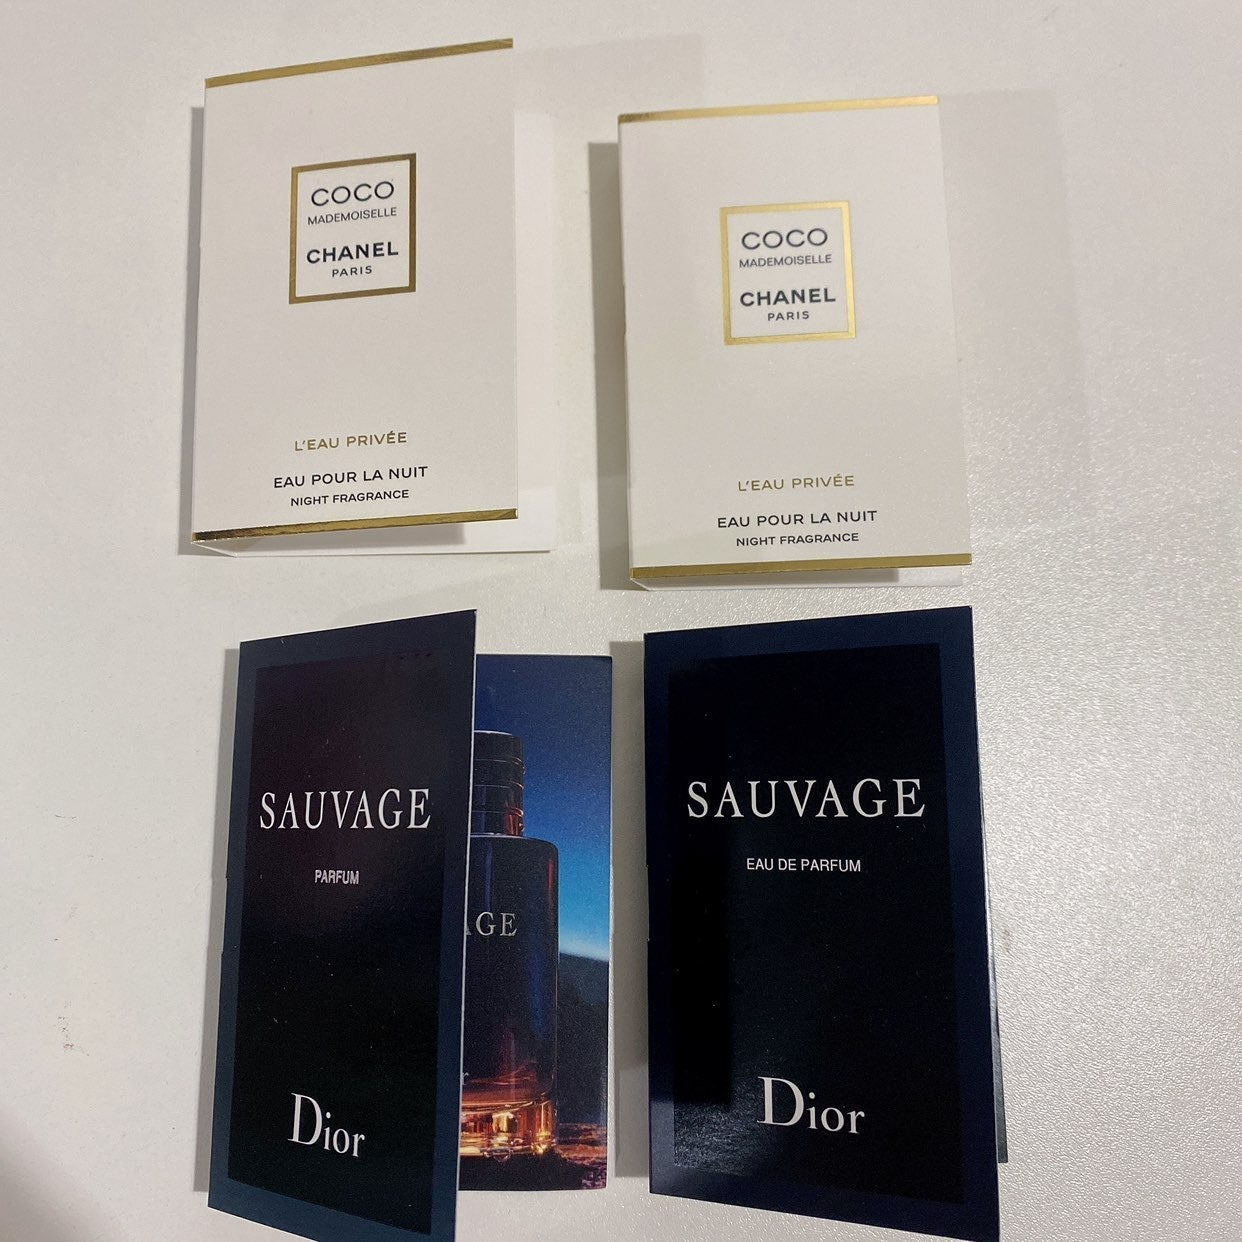 Chanel Dior perfume fragrances samples